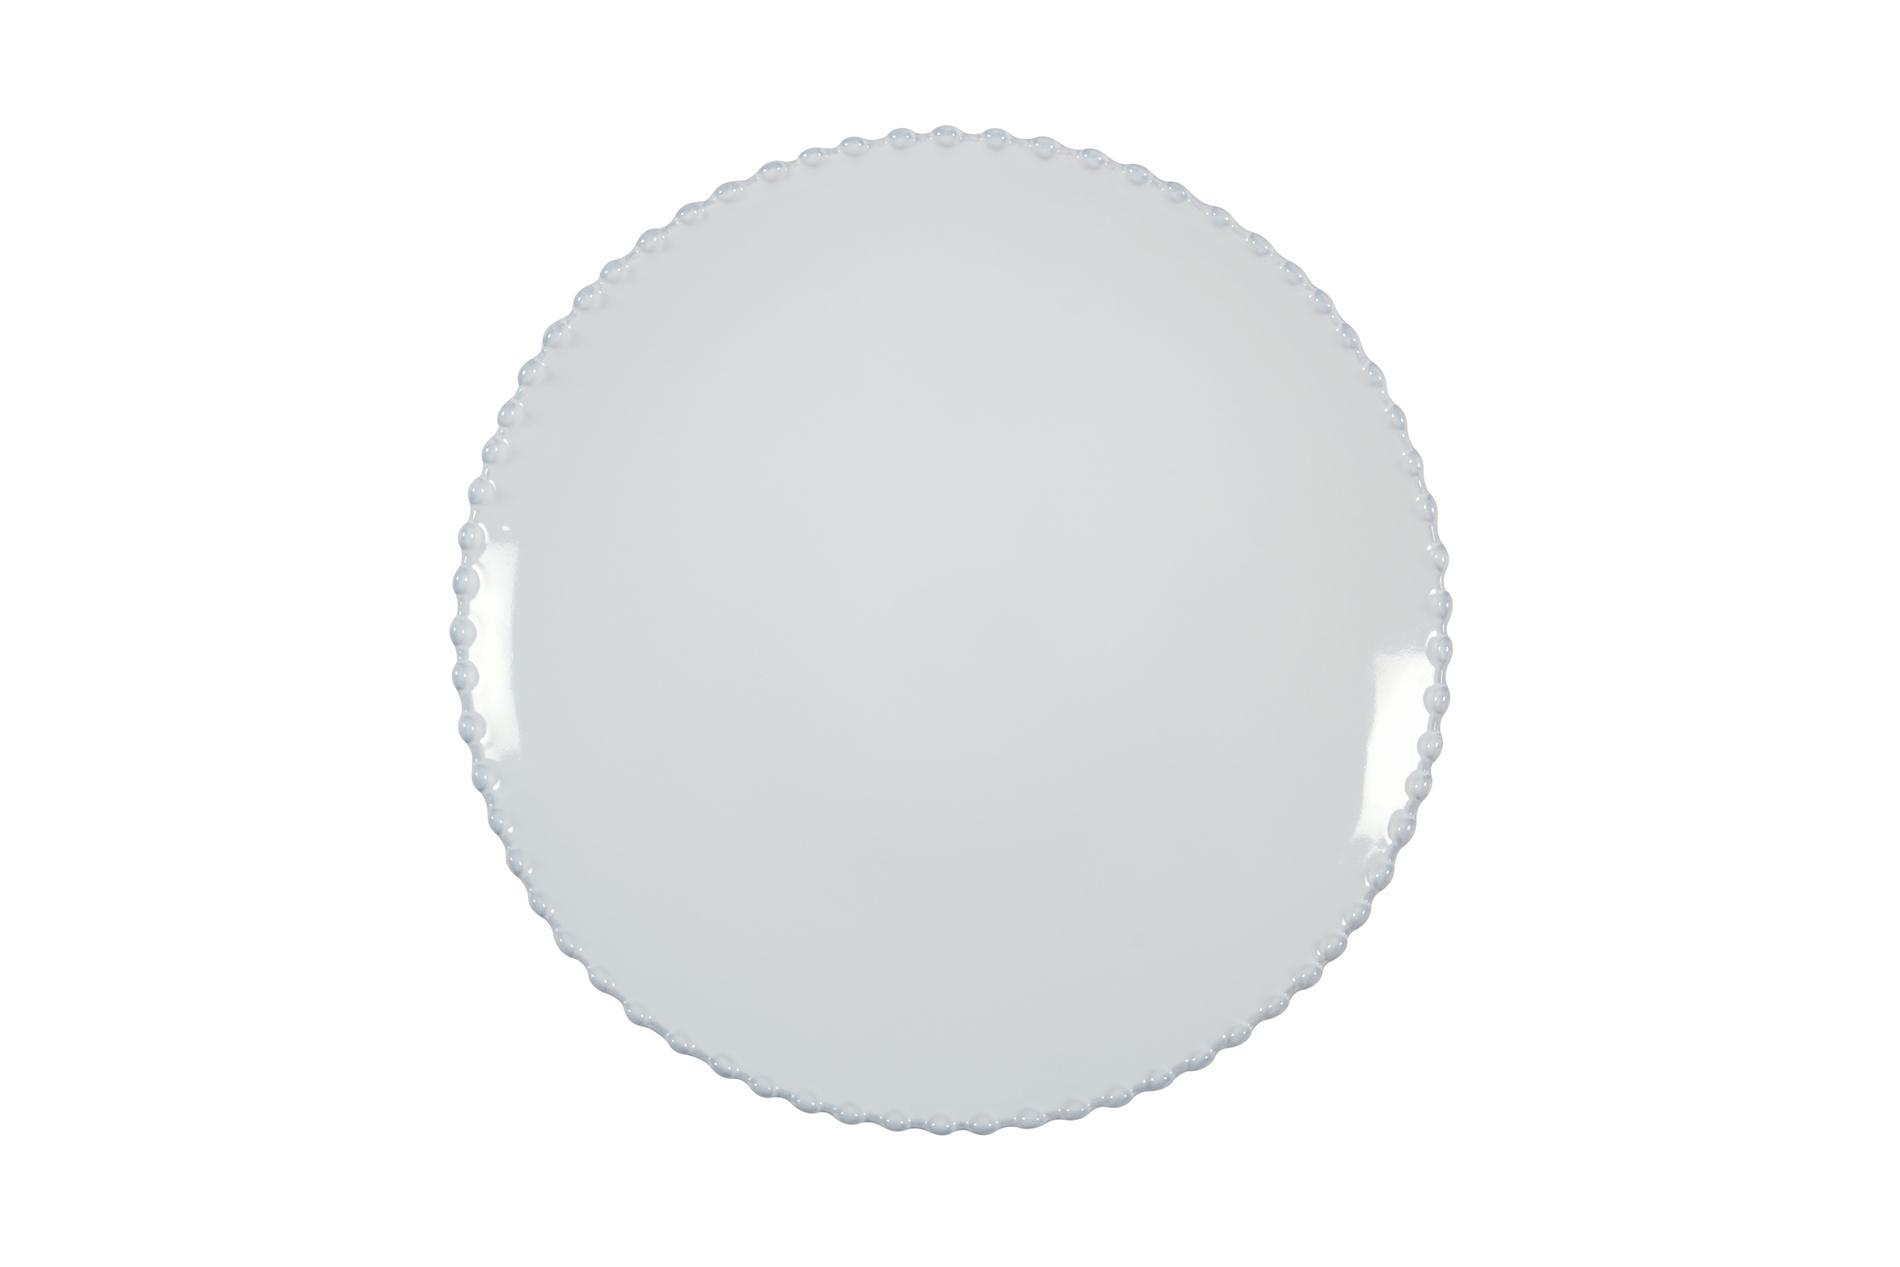 Kuchenteller / Dessertteller  / Salatteller Pearl, weiß, 22 cm